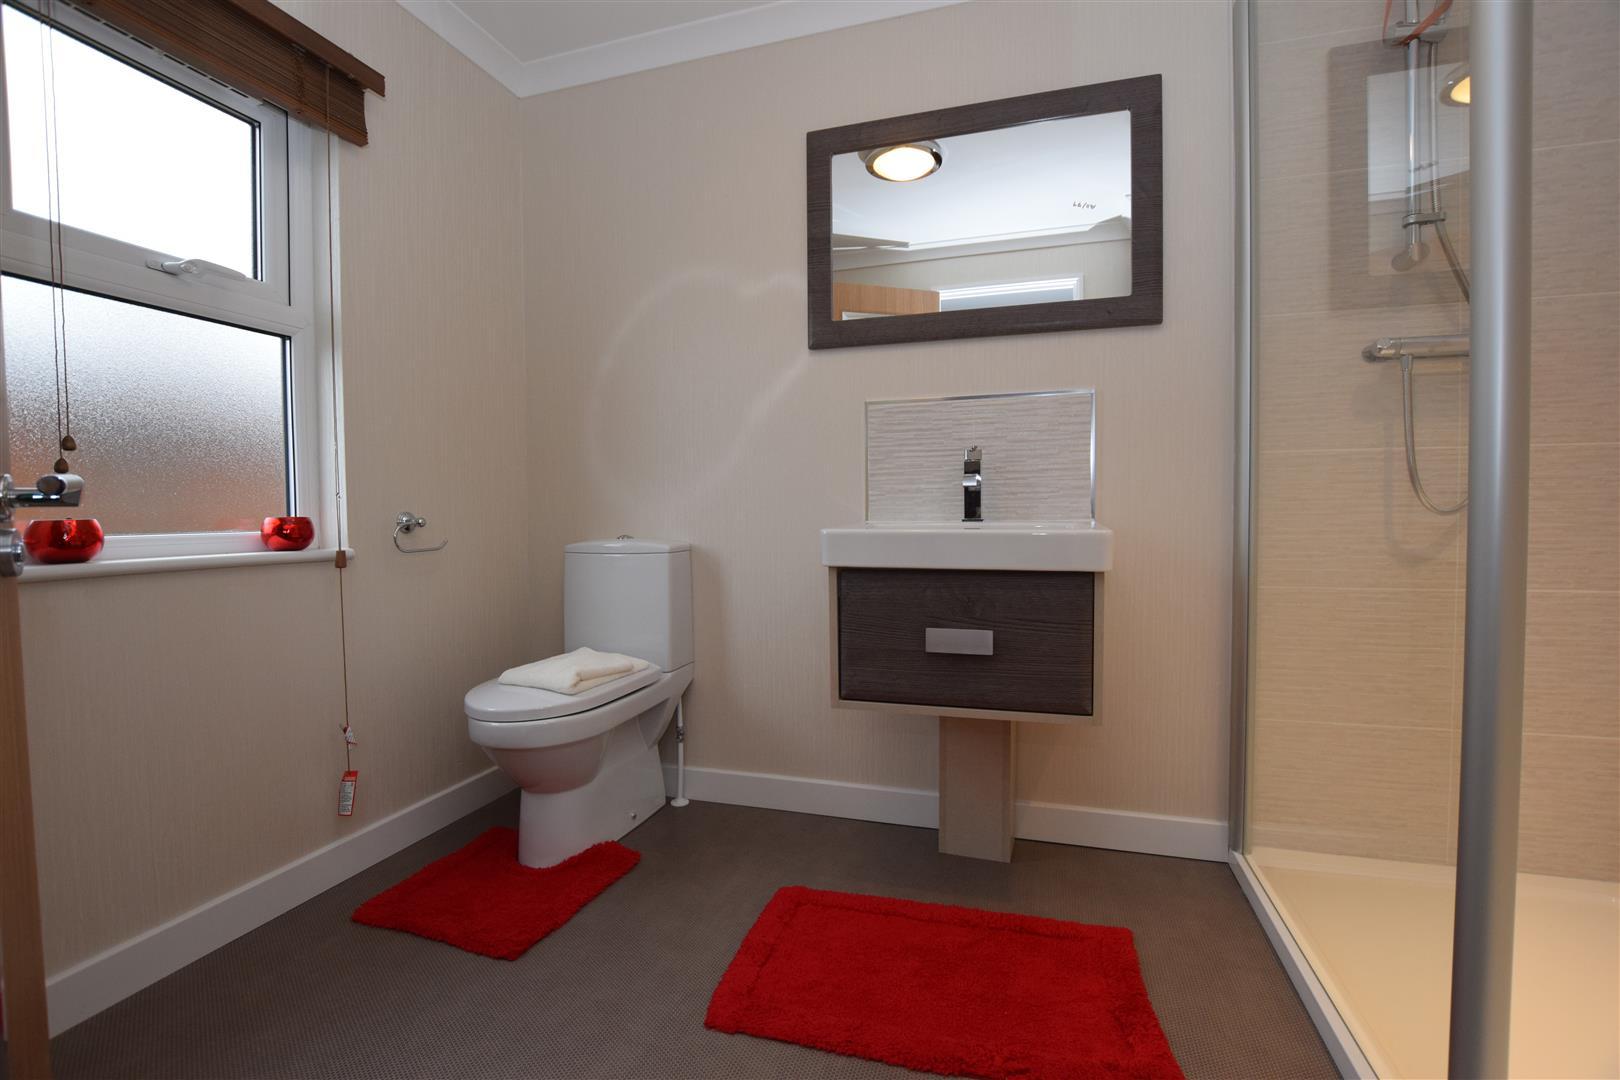 Plot 5, Omar Accent Lodge, Lochmanor Lodge Estate, Dunning, Dunning Perth, Perthshire, PH2 0QN, UK